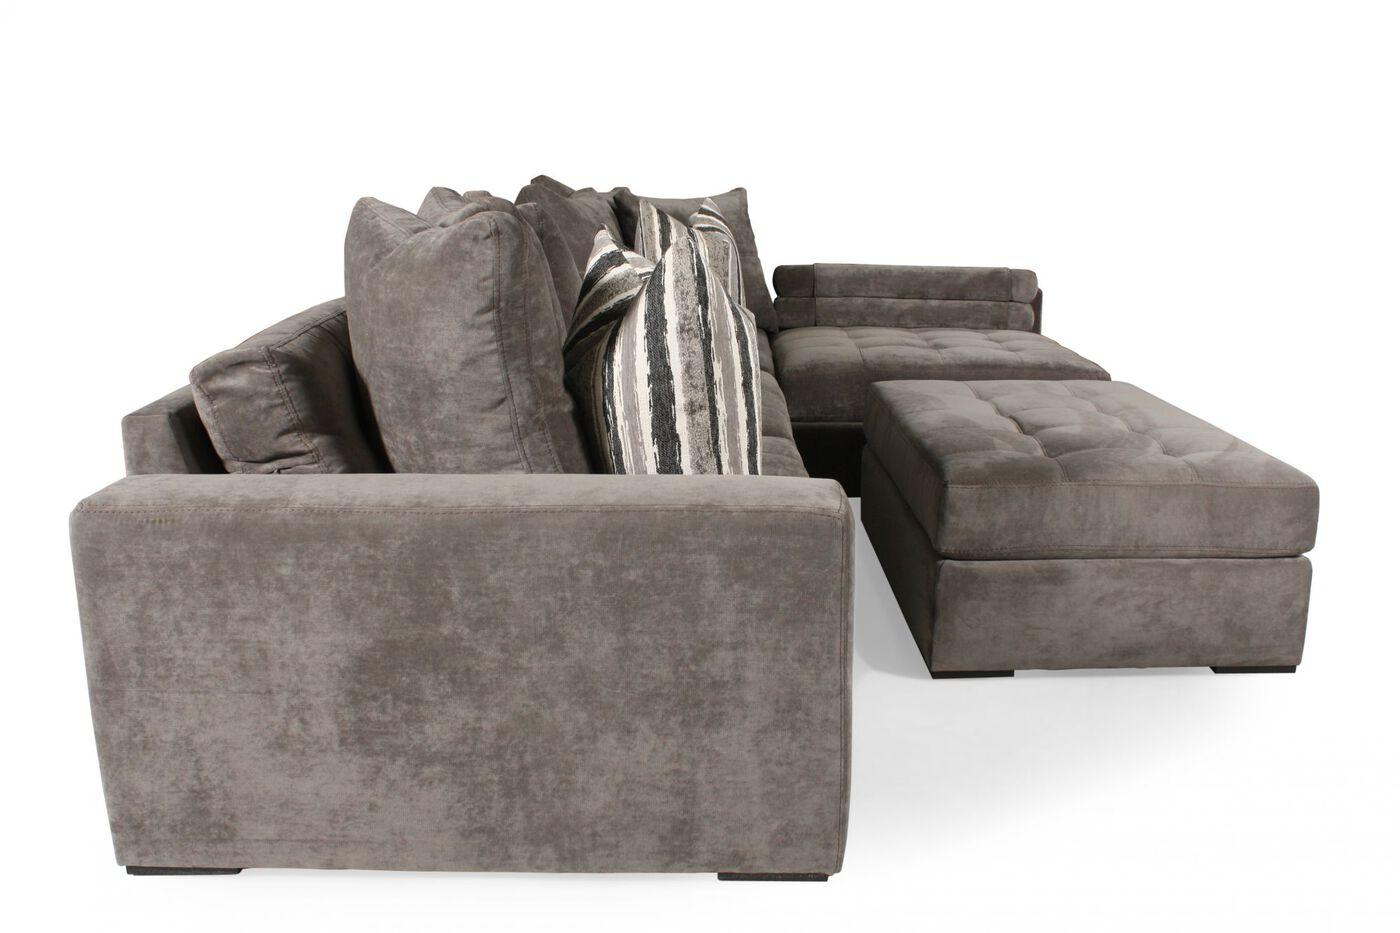 Jonathan Louis Noah Gray Sectional : Mathis Brothers Furniture